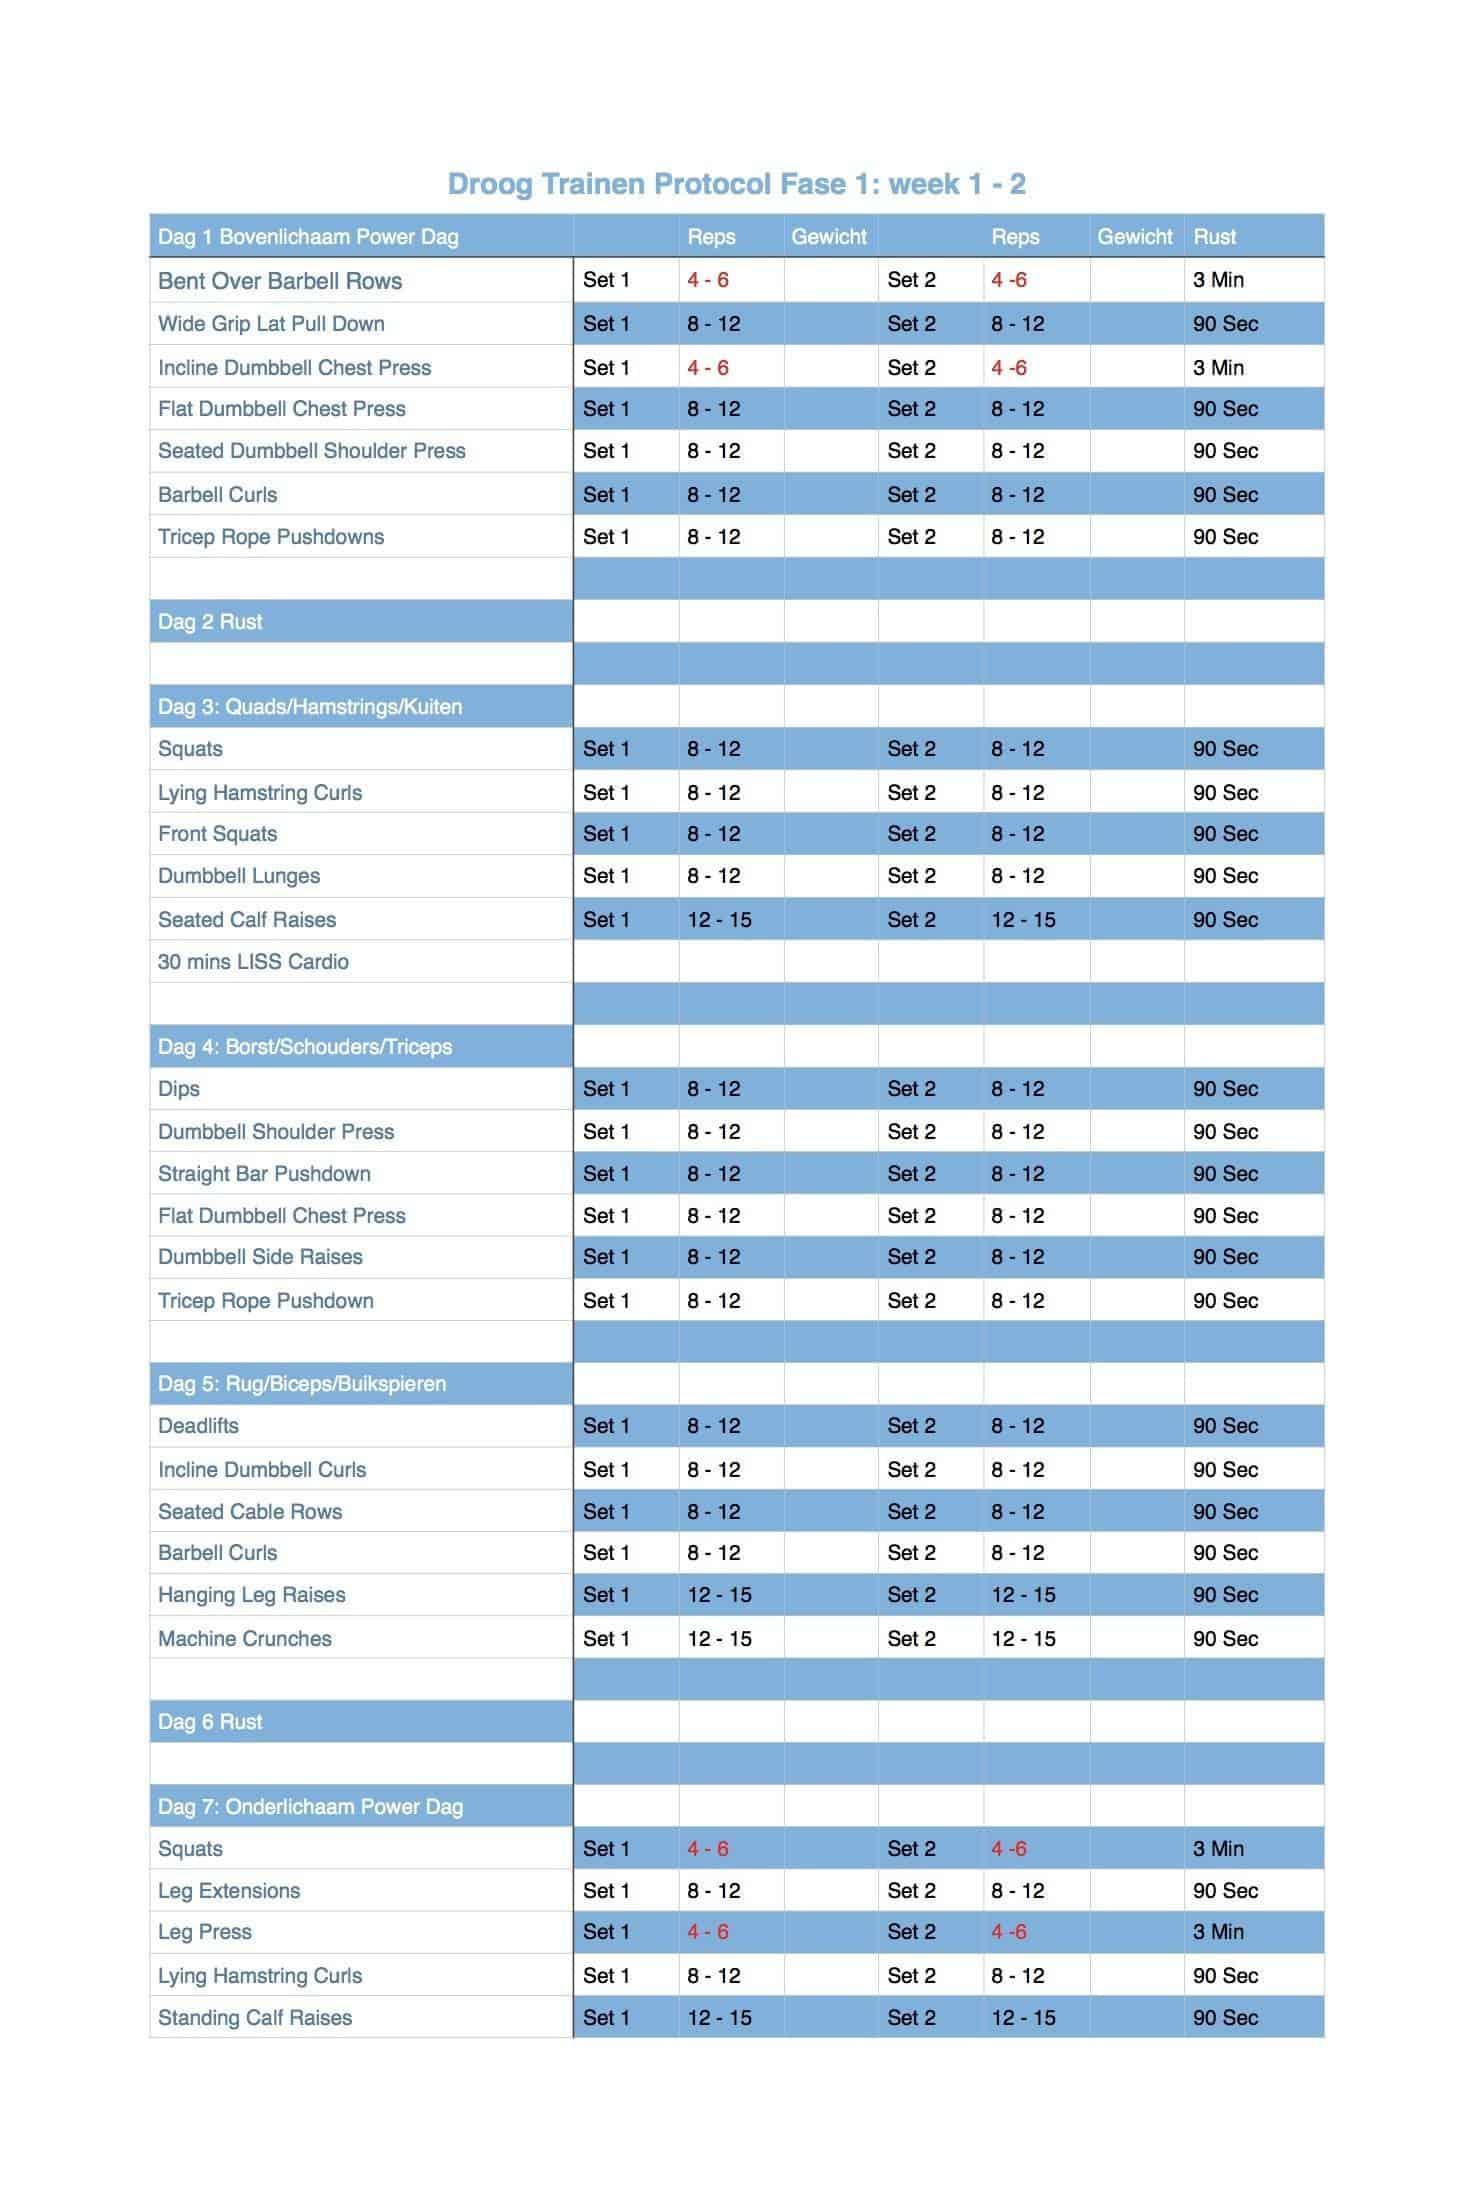 droog trainen protocol schema training pdf